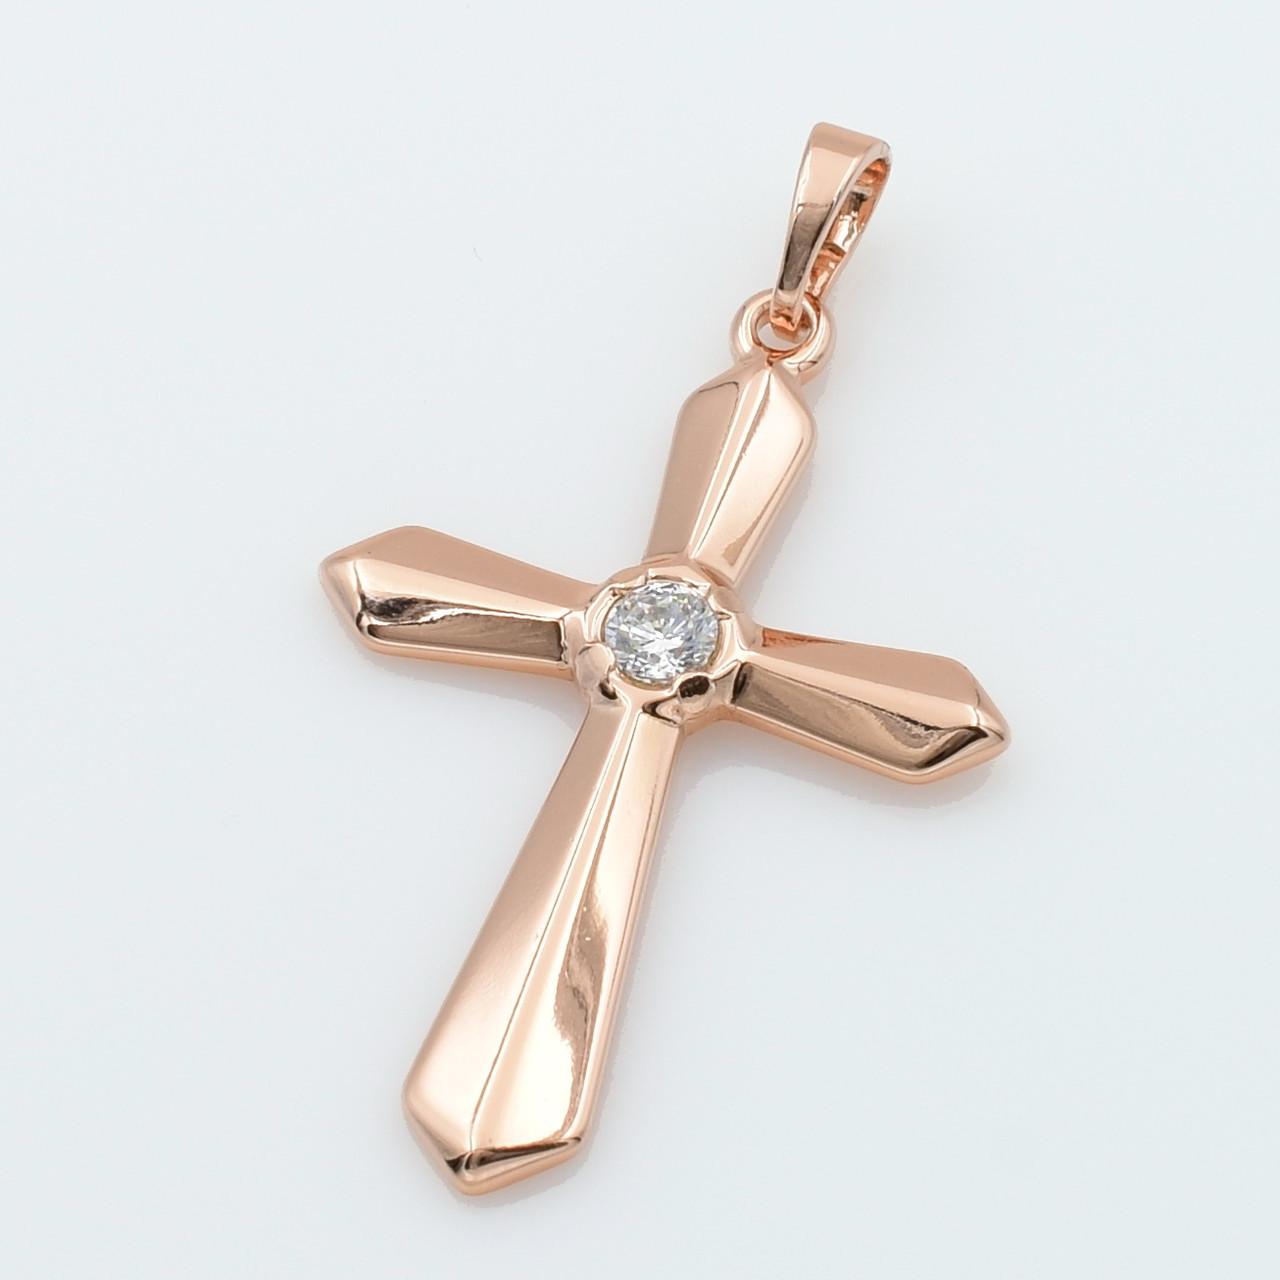 XUPING Кулон Крест Позолота РО с белым цирконом Высота 3.9см, Ширина 2.3см